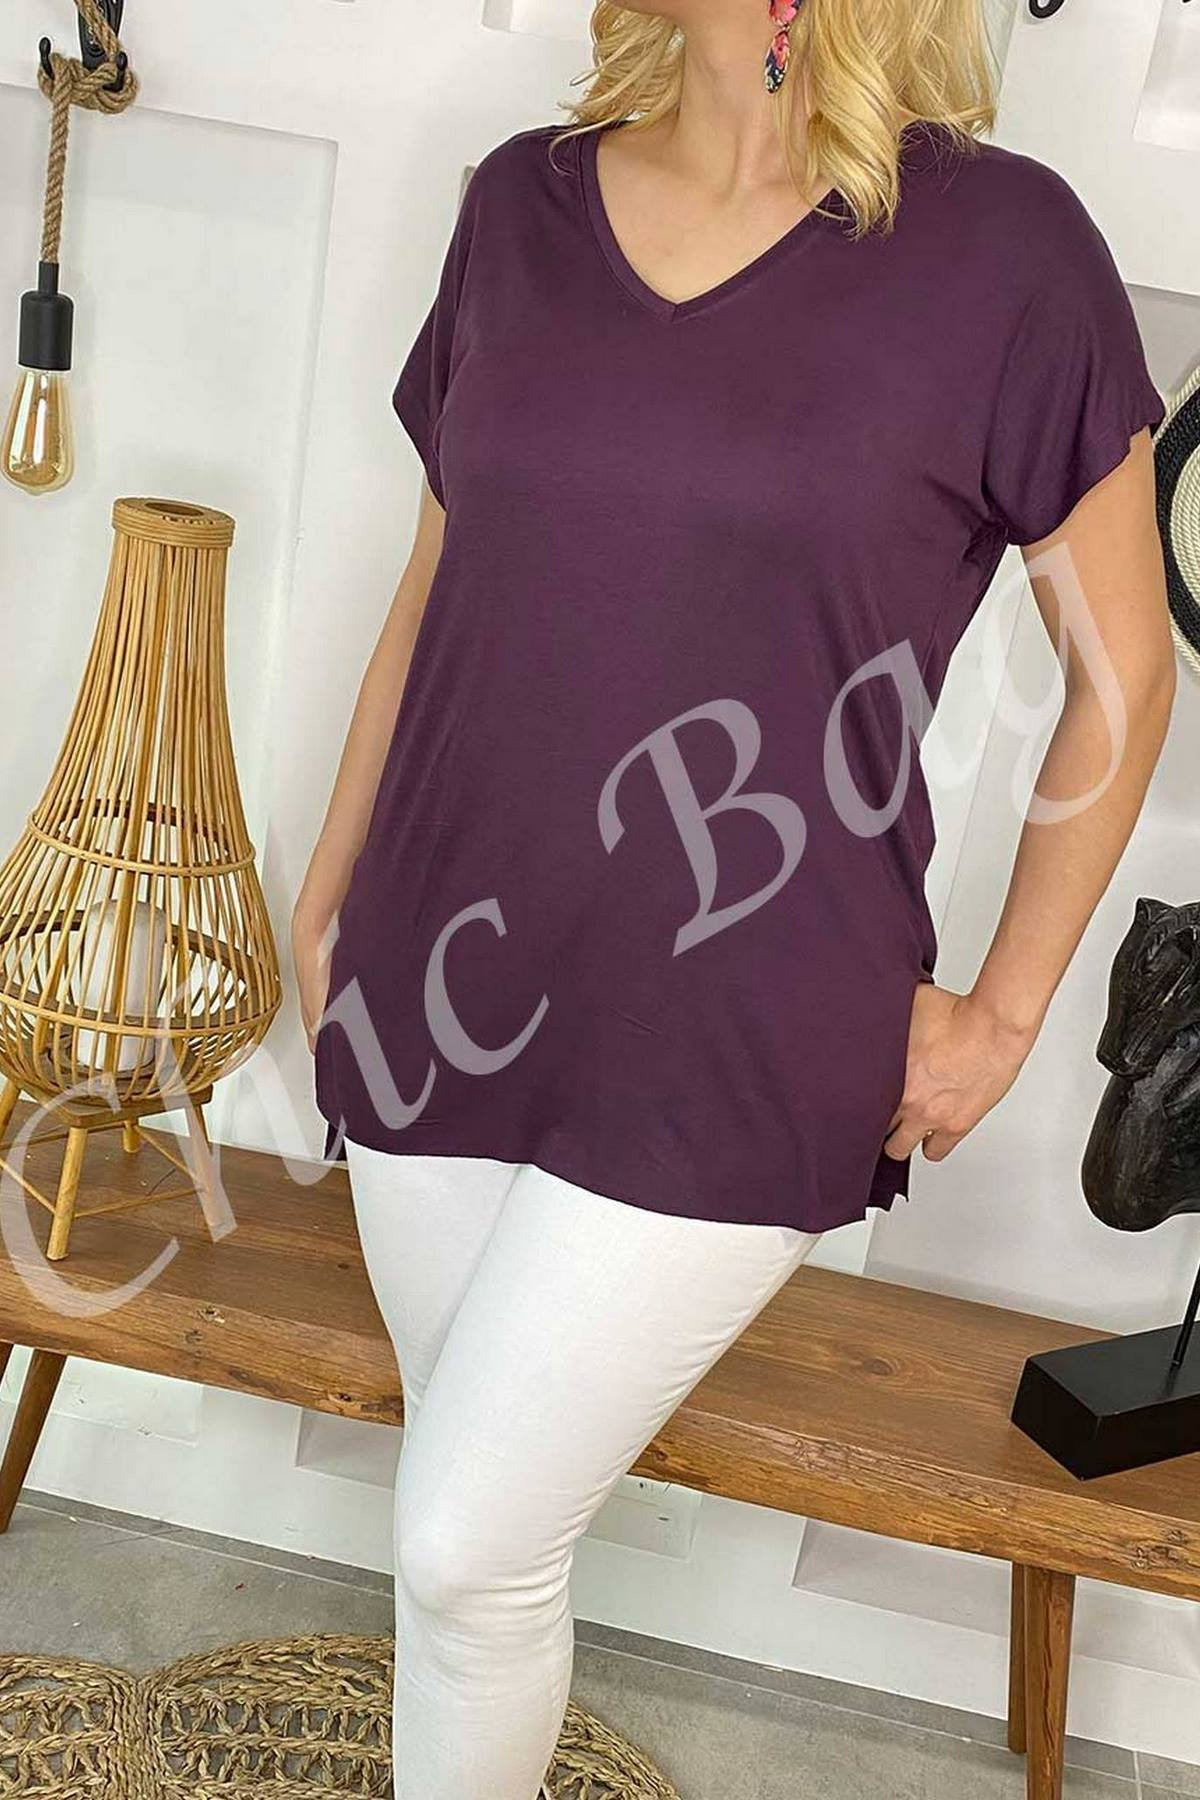 https://resim.chicbag.com.tr/p000879/mor/v-yaka-etegi-kesik-ve-yirtmacli-t-shirt-thscrt-01e46e348f0b.